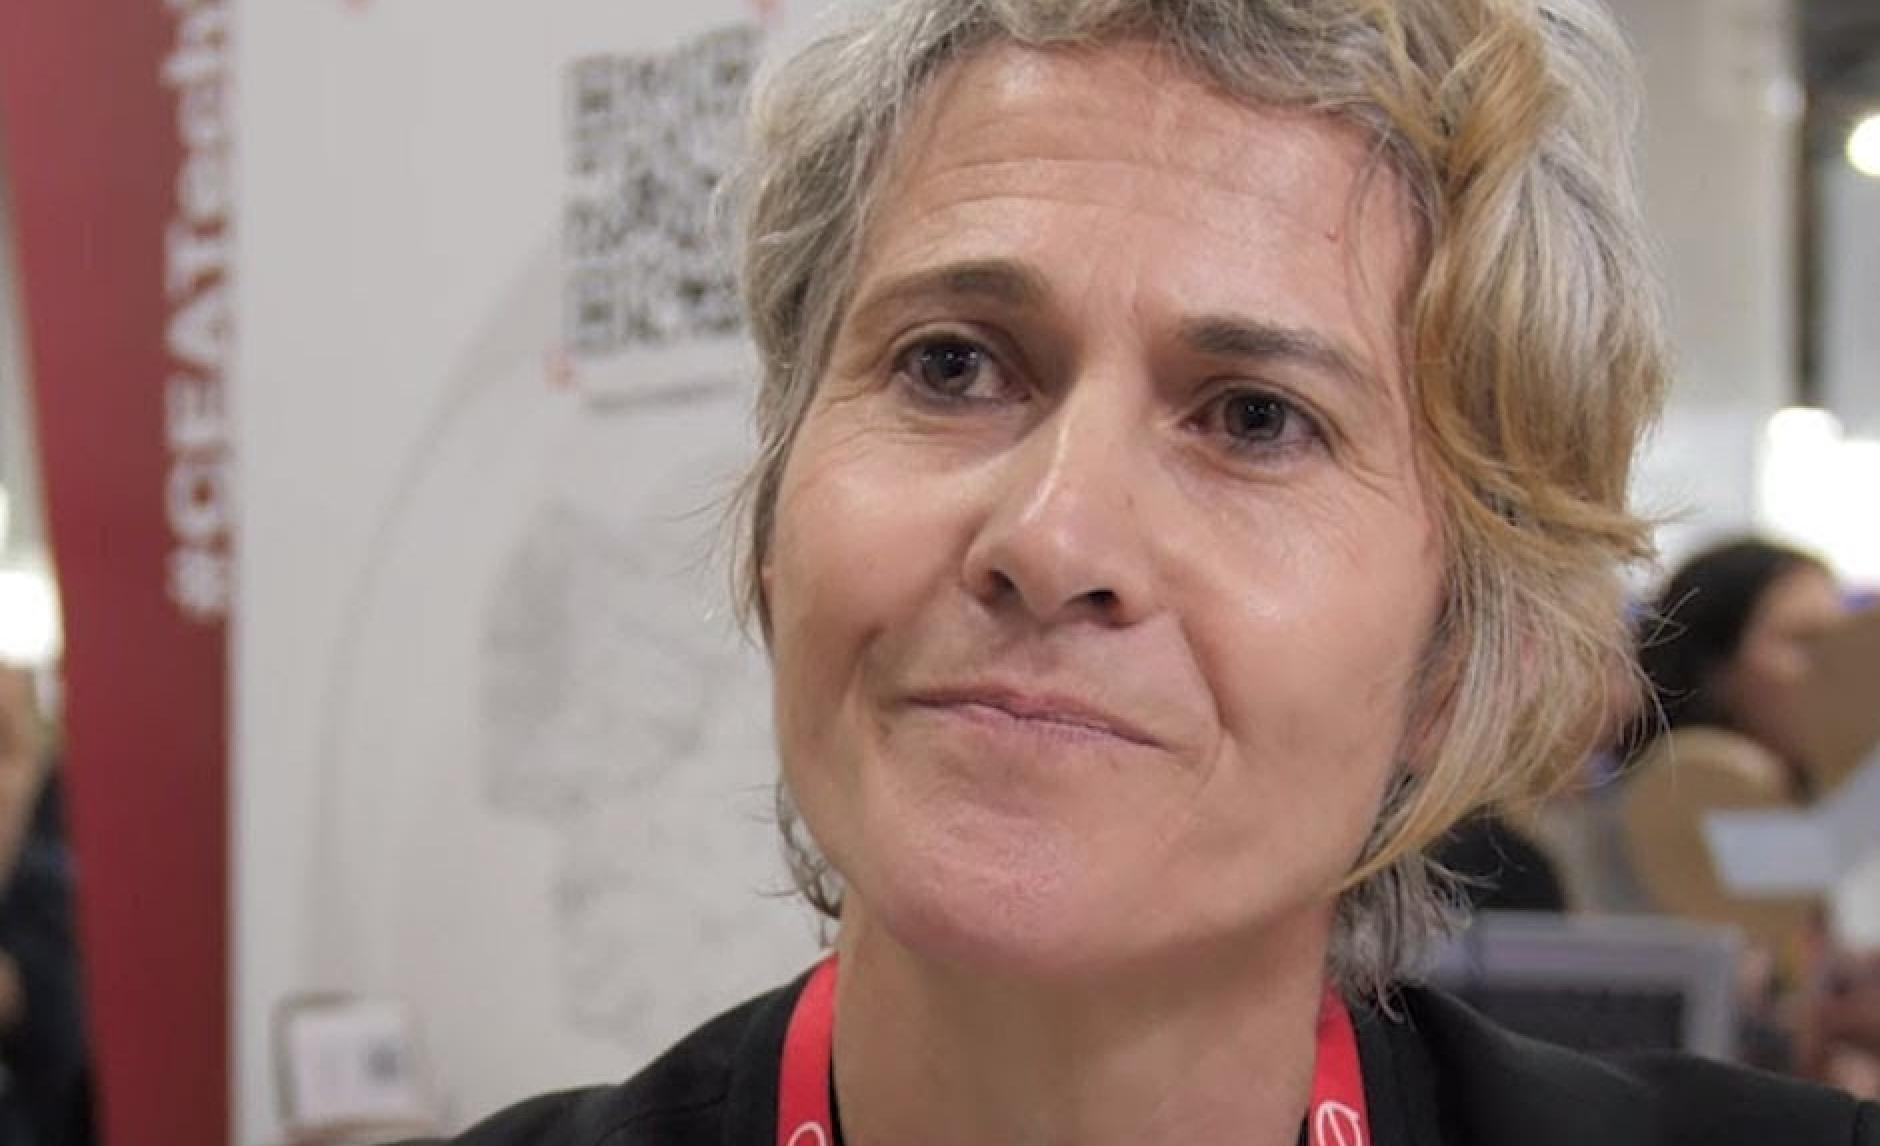 Corinne Borel, directrice déléguée à l'essaimage du CEA